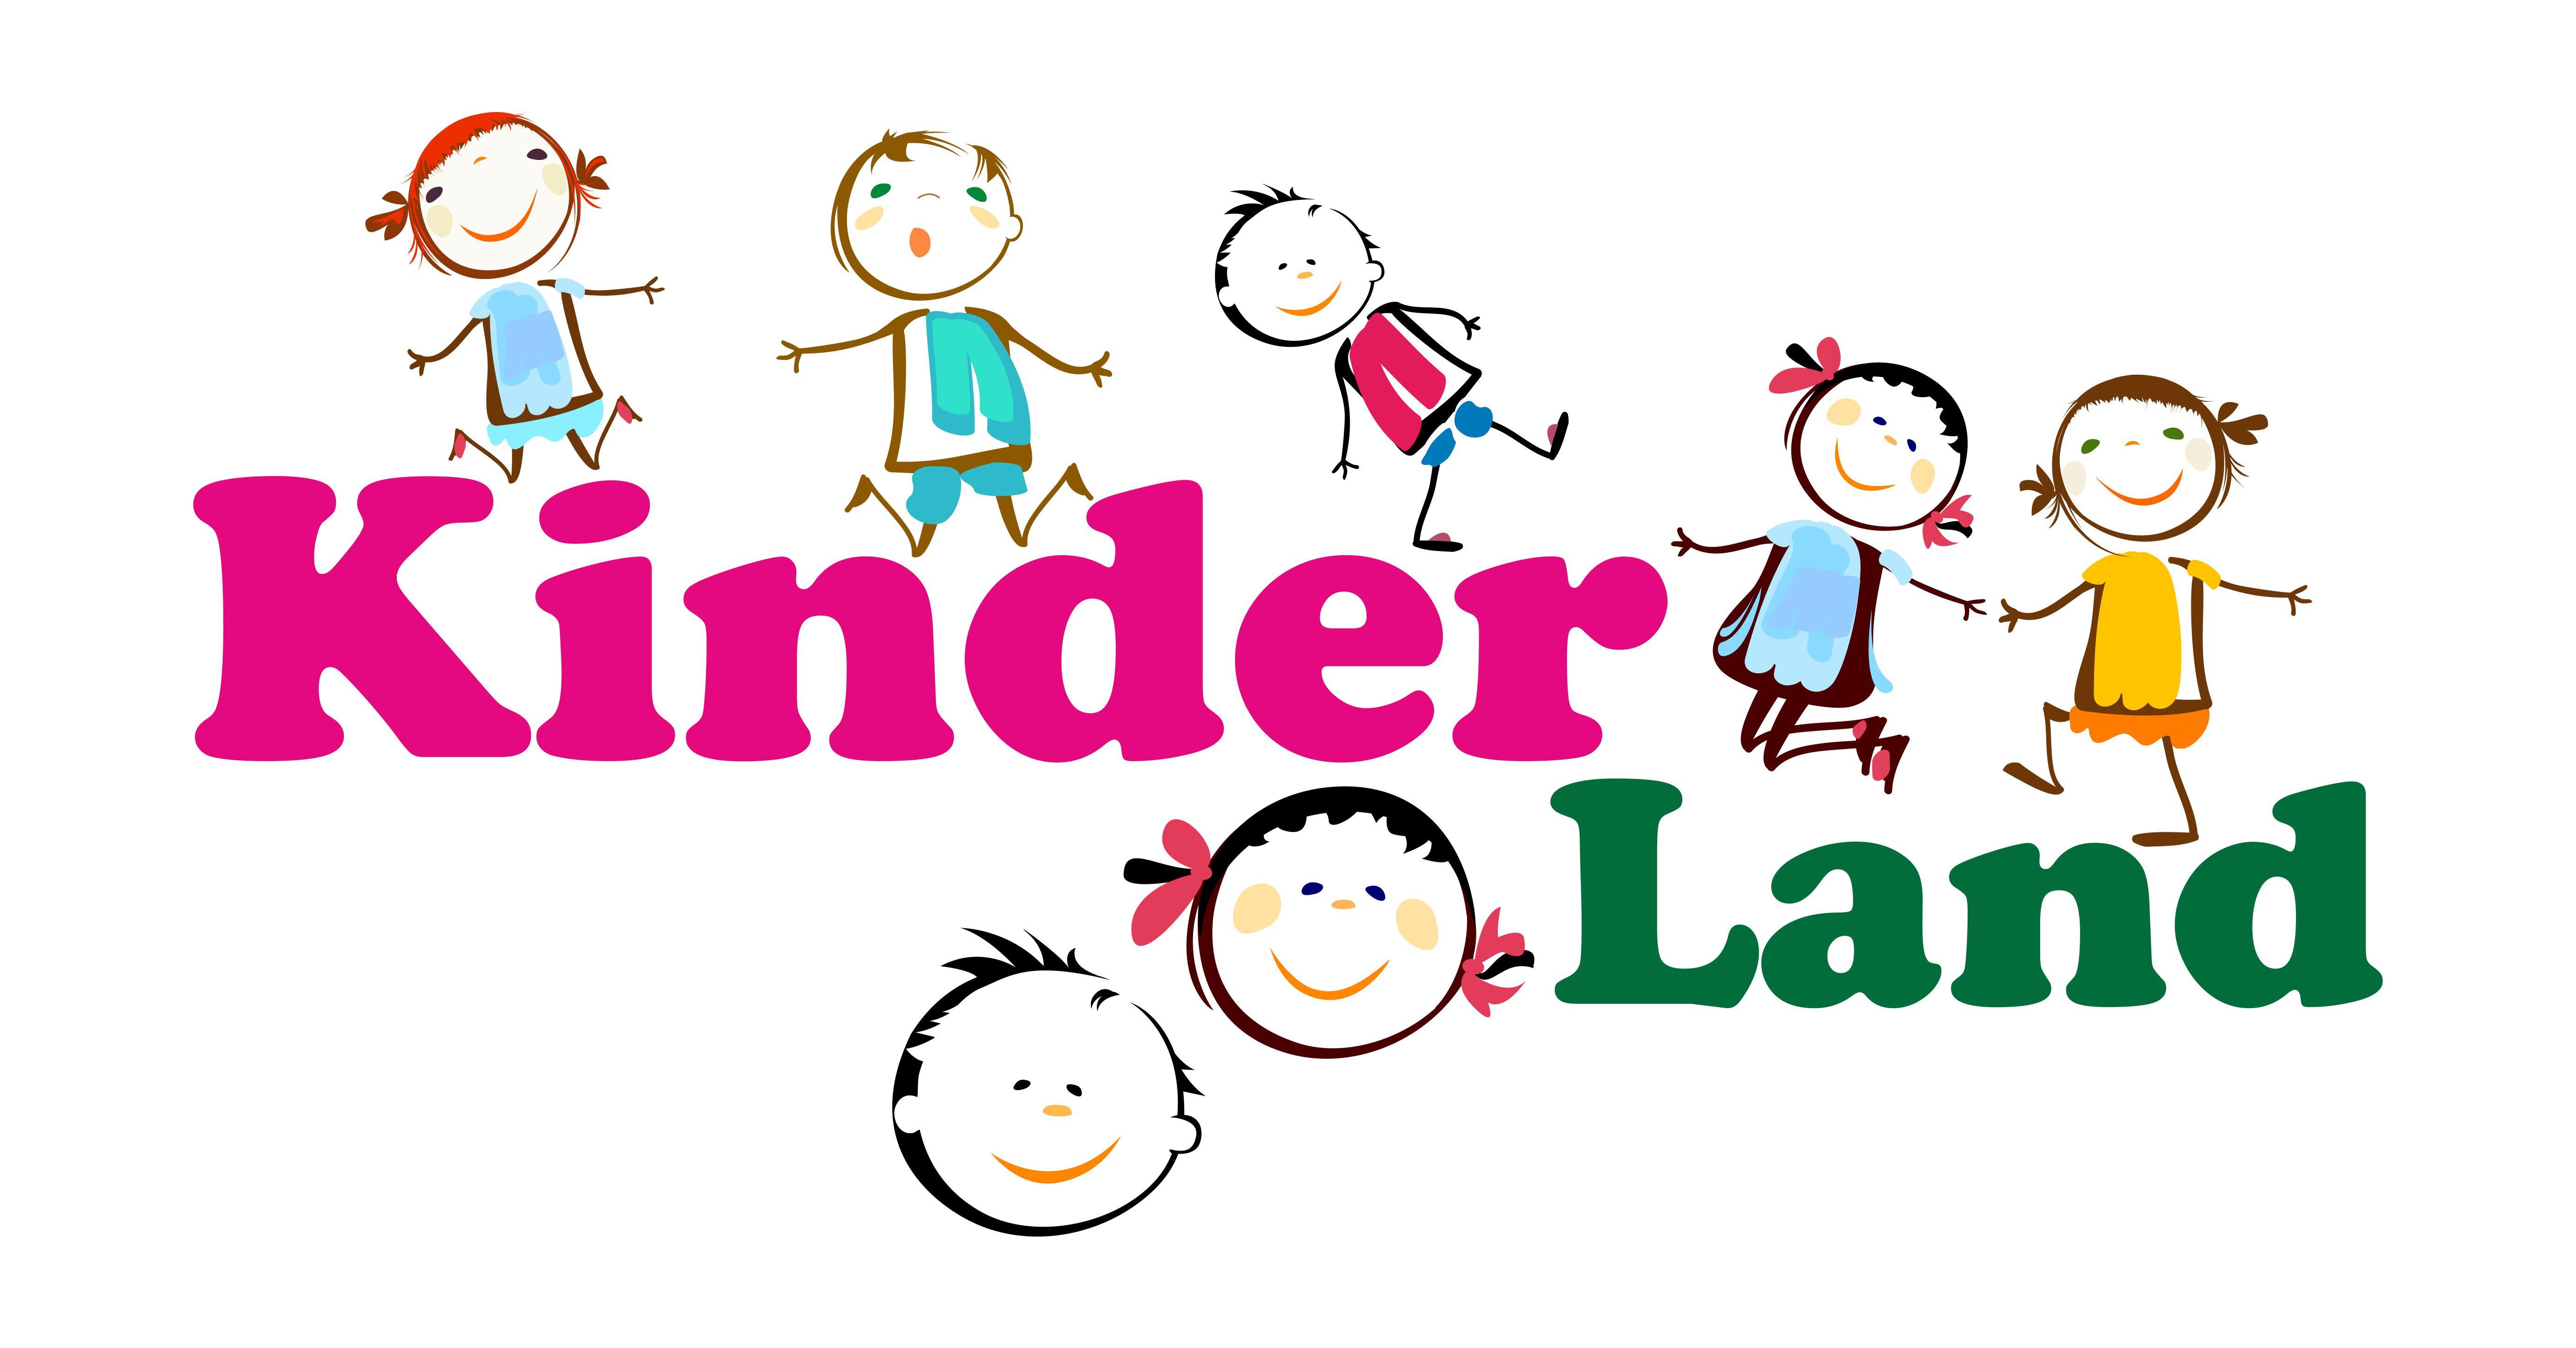 Job English Teacher For Nursery at Kinder Land